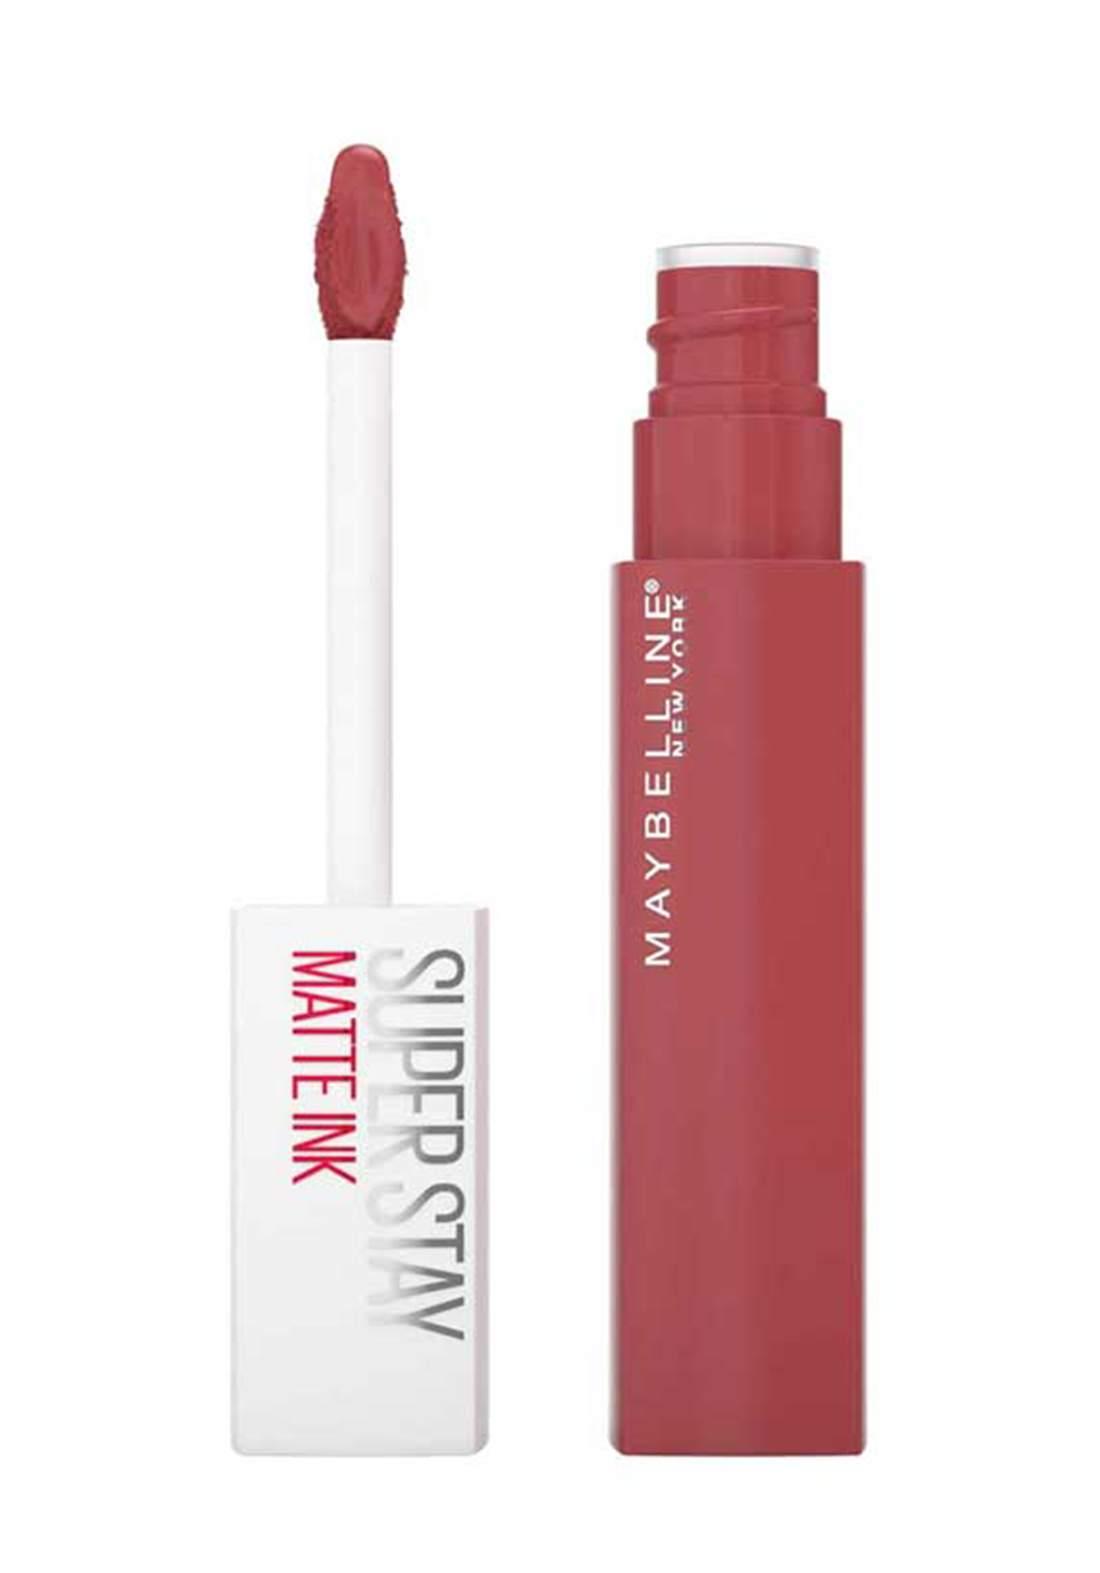 (022-1263)Maybelline SuperStay Matte Ink Liquid Lipstick 5 ml Initia No:170 احمر شفاه